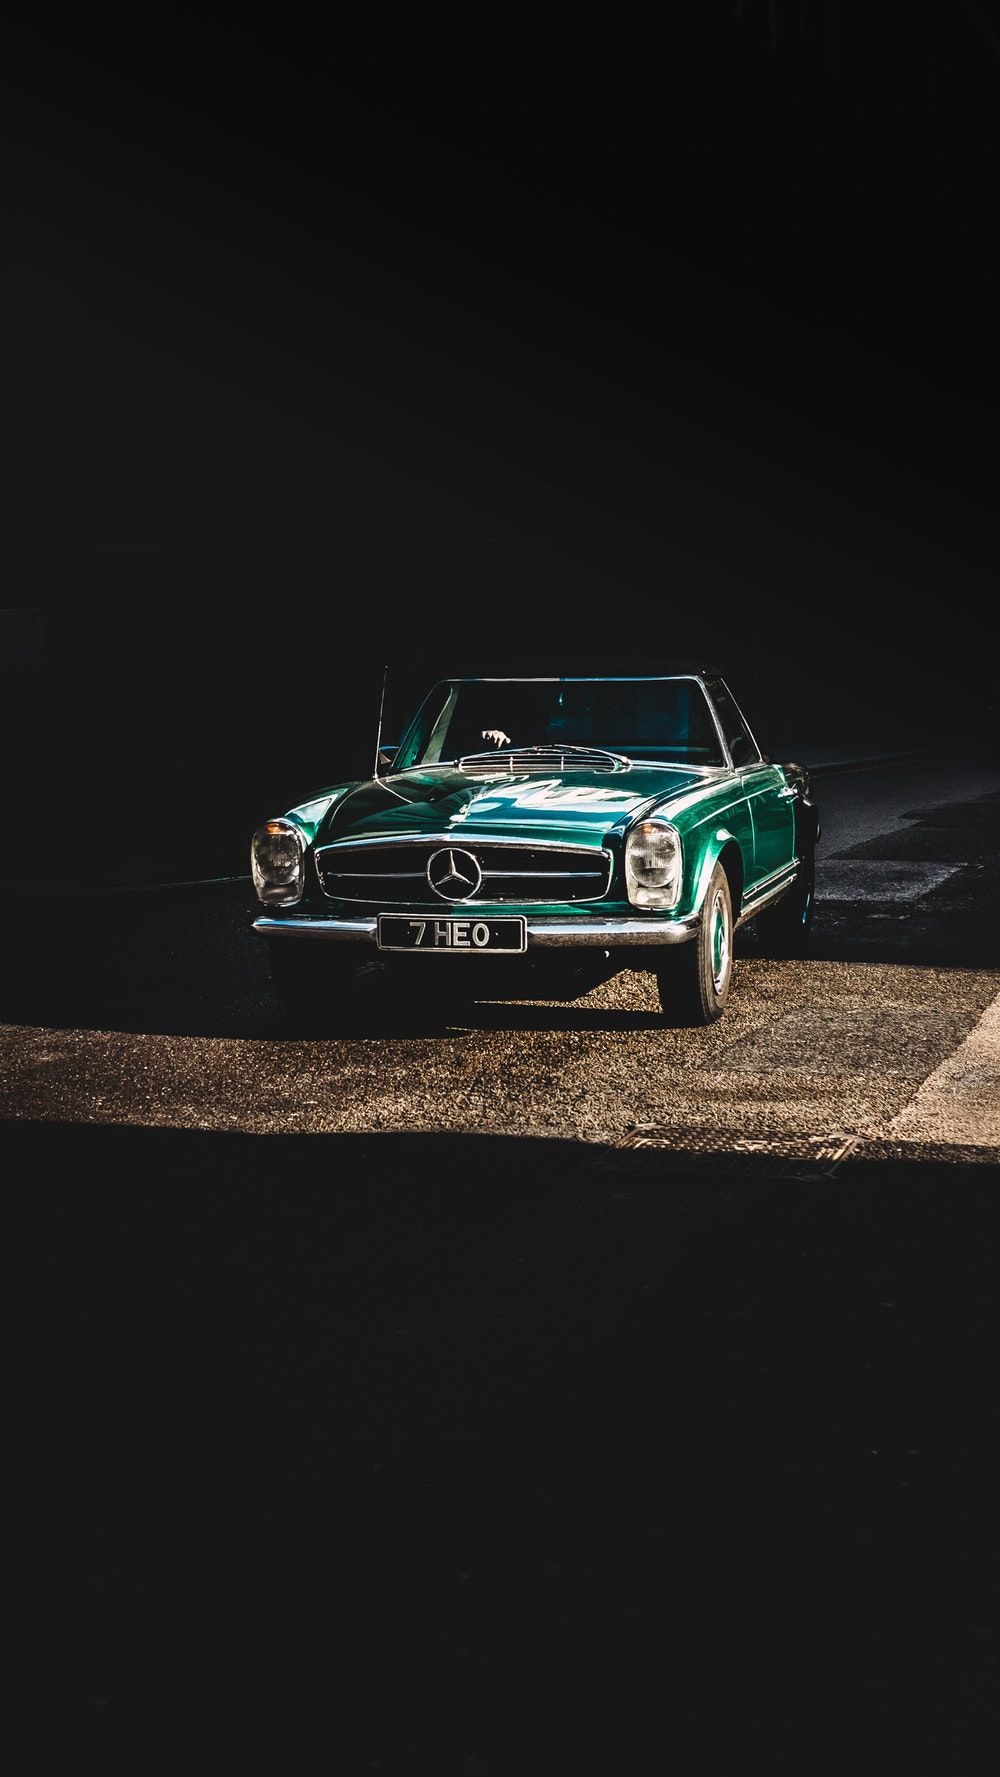 Mercedes-Benz iPhone 7 Wallpapers - Top Free Mercedes-Benz ...